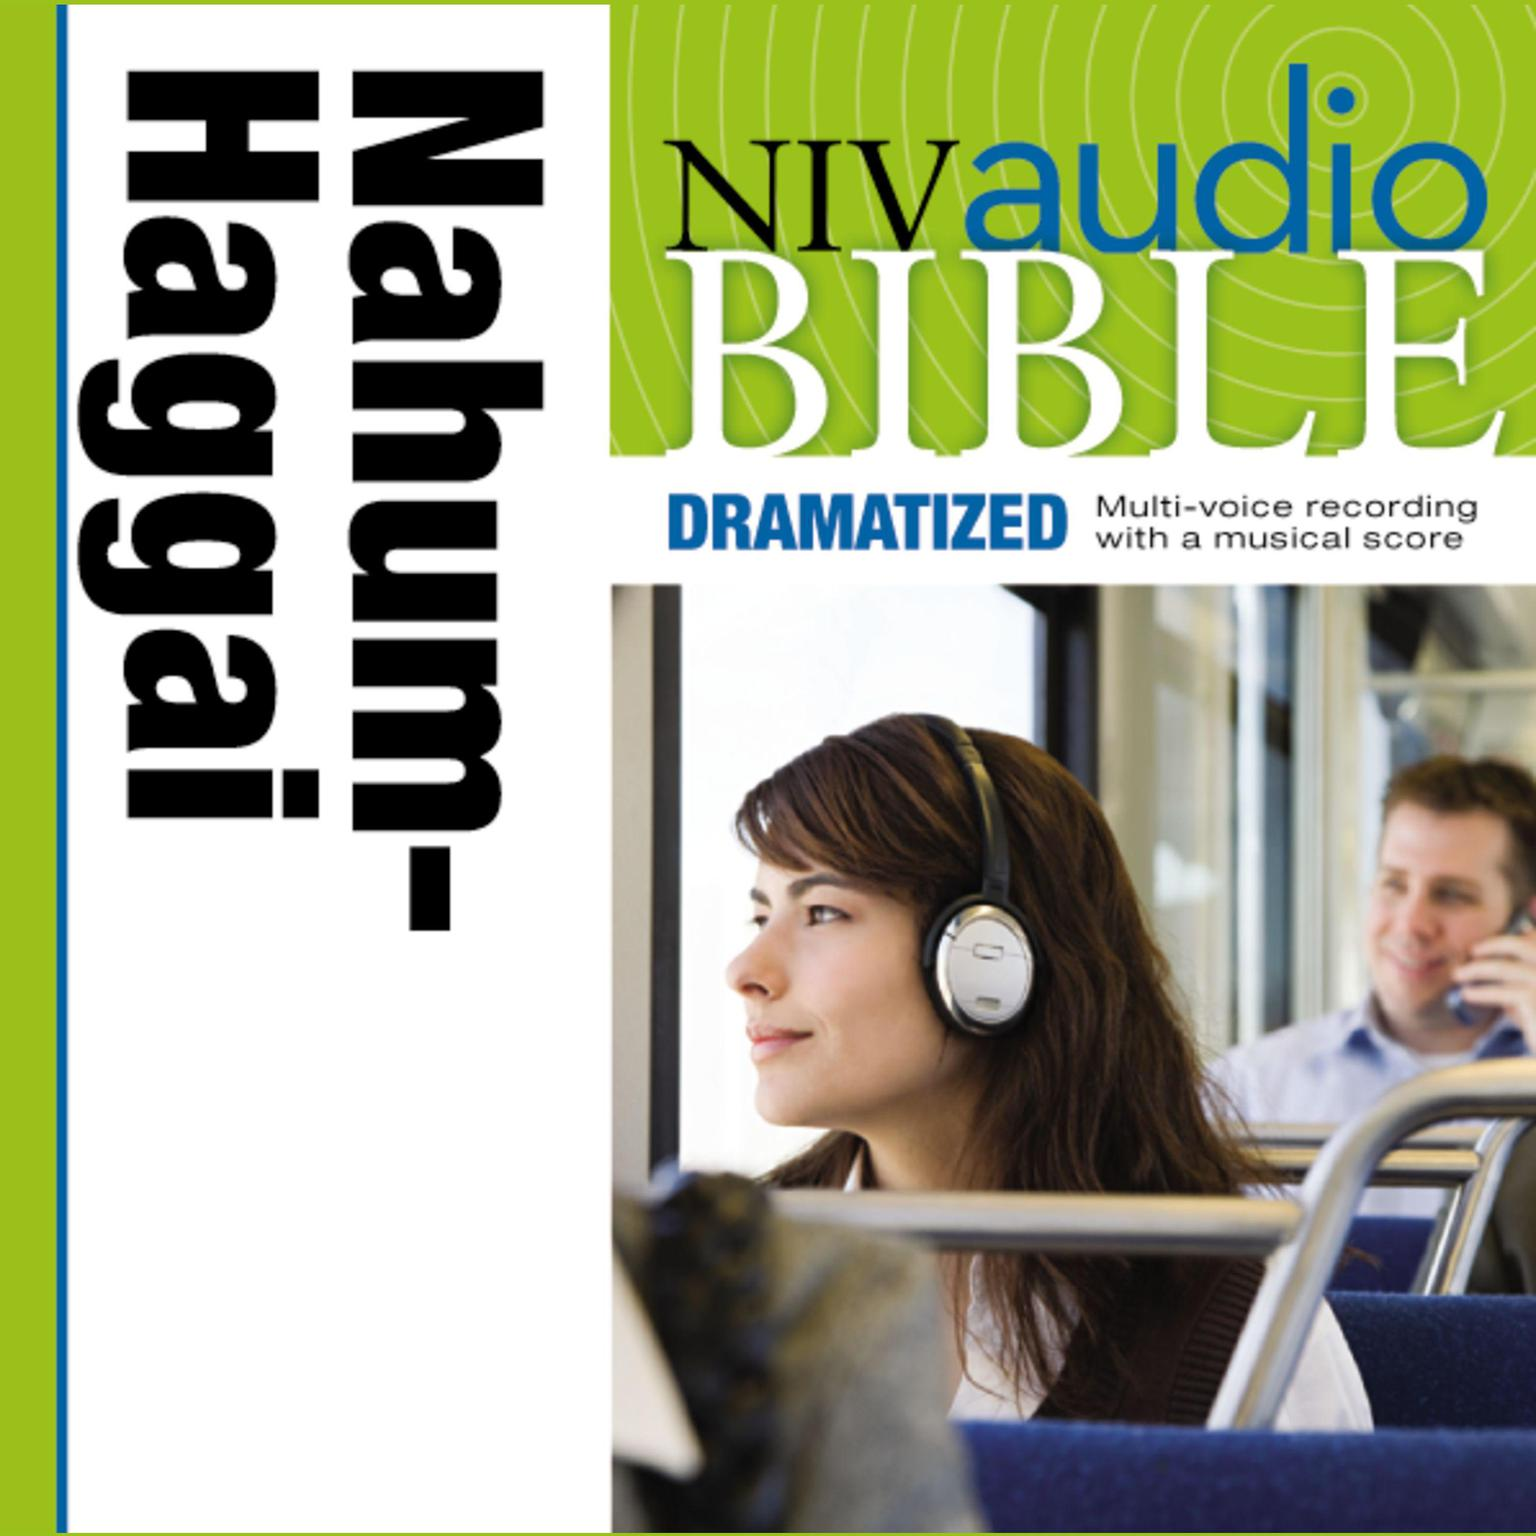 Printable NIV, Audio Bible, Dramatized: Nahum, Habakkuk, Zephaniah, and Haggai, Audio Download Audiobook Cover Art